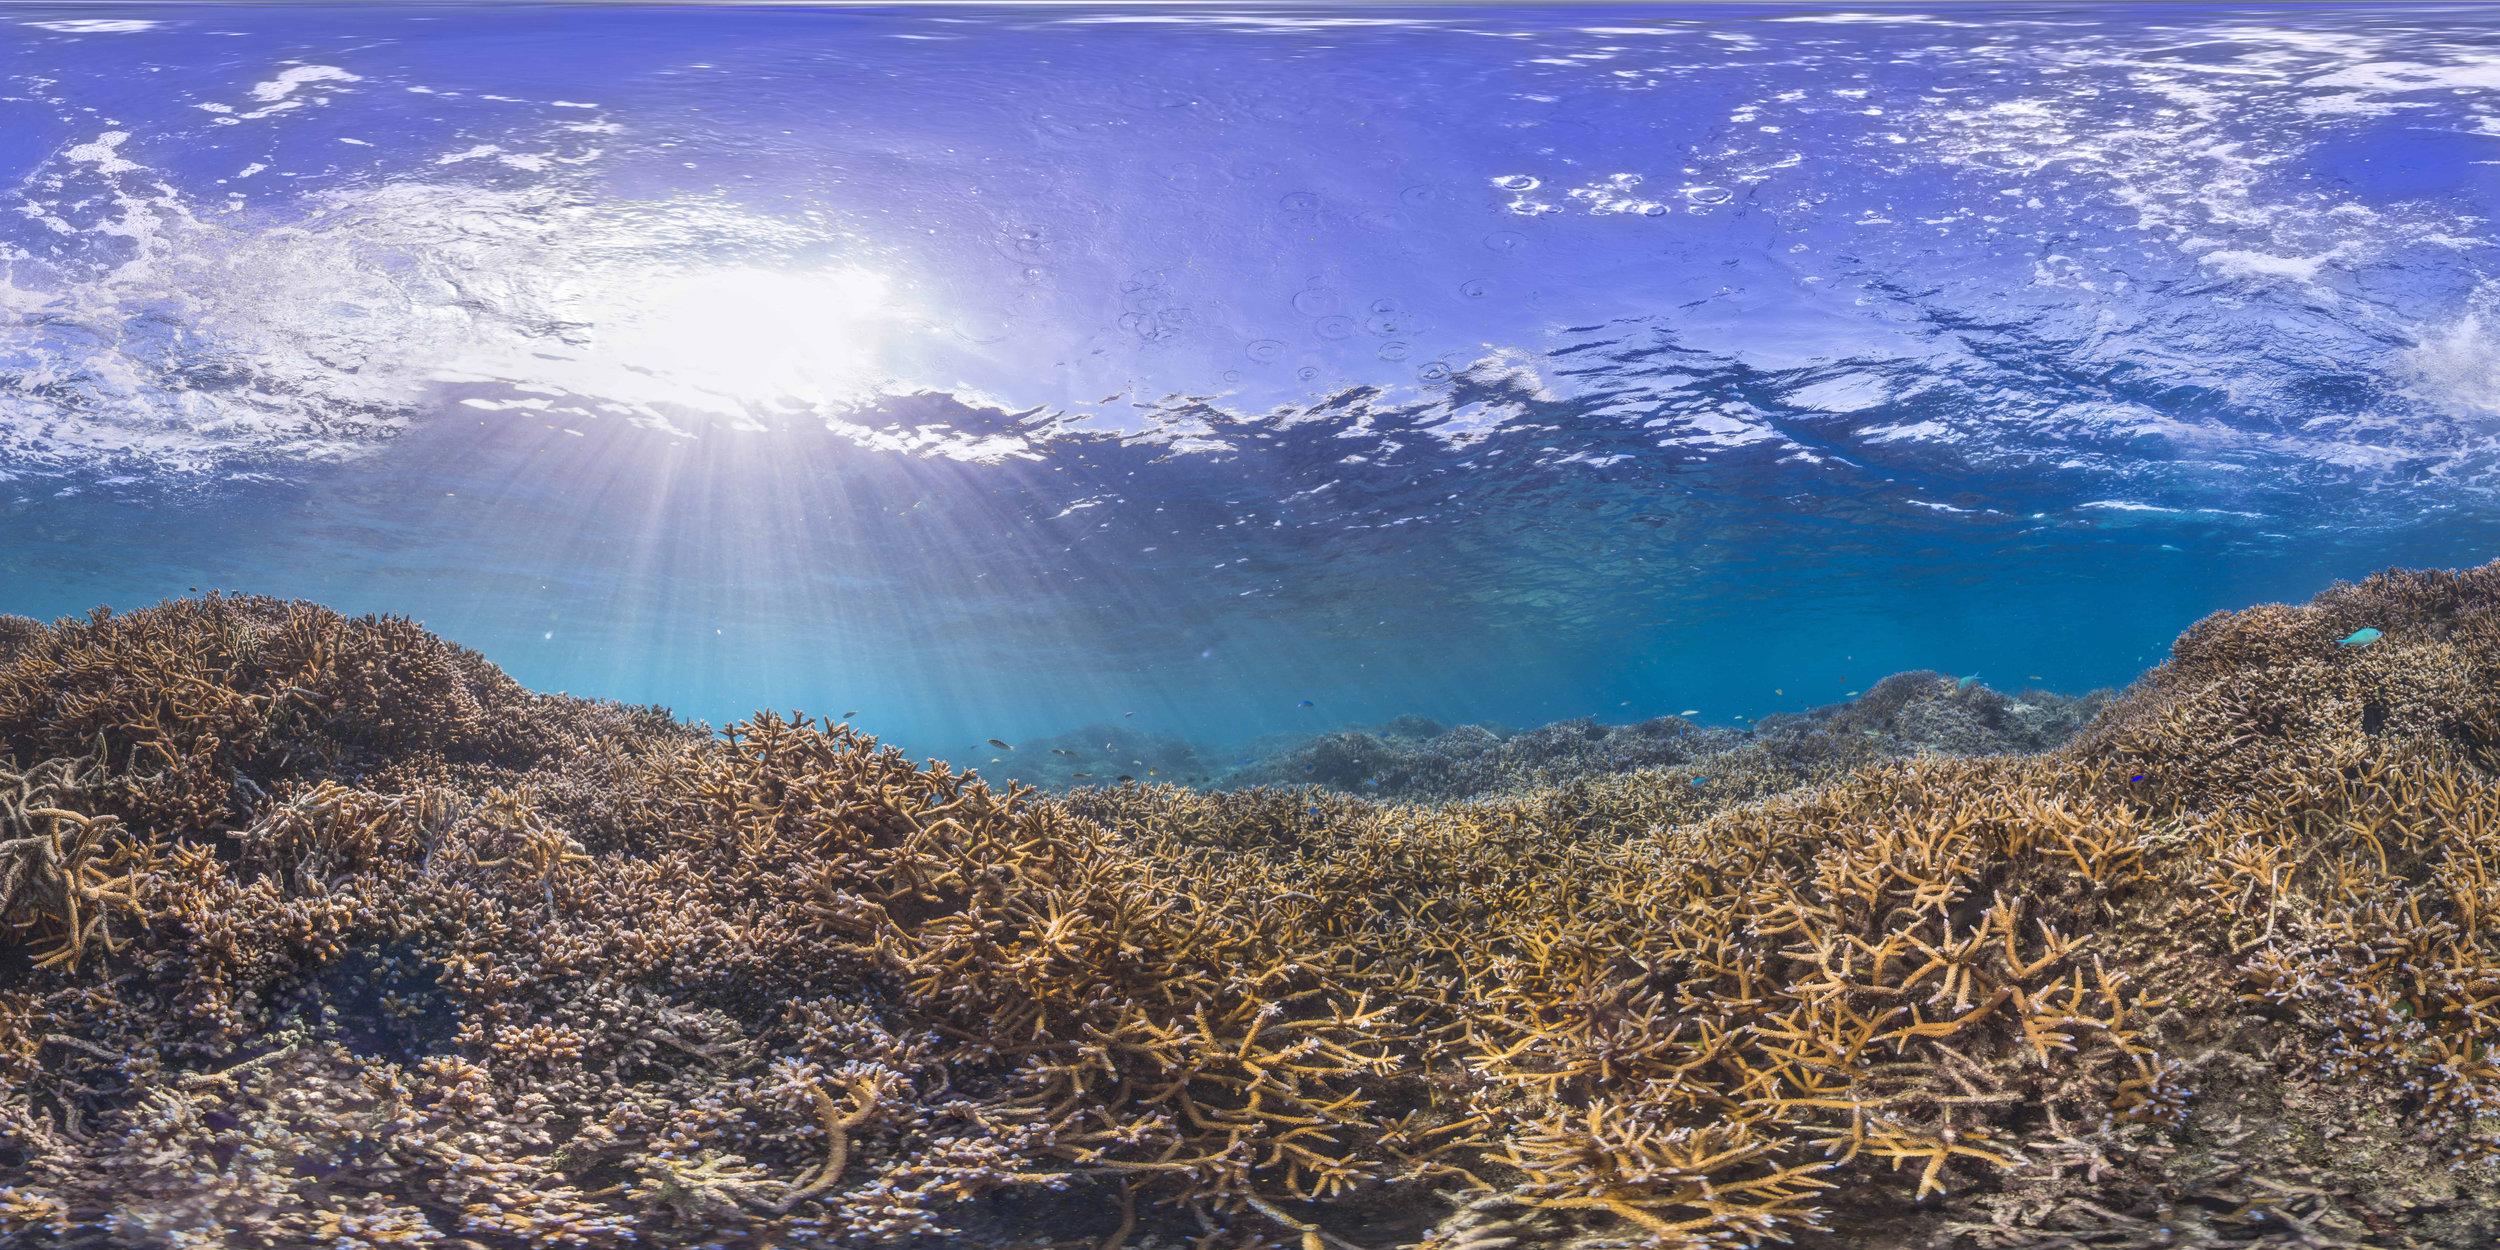 American samoa, dec 2014 credit: THE OCEAN AGENCY / XL CATLIN SEAVIEW SURVEY